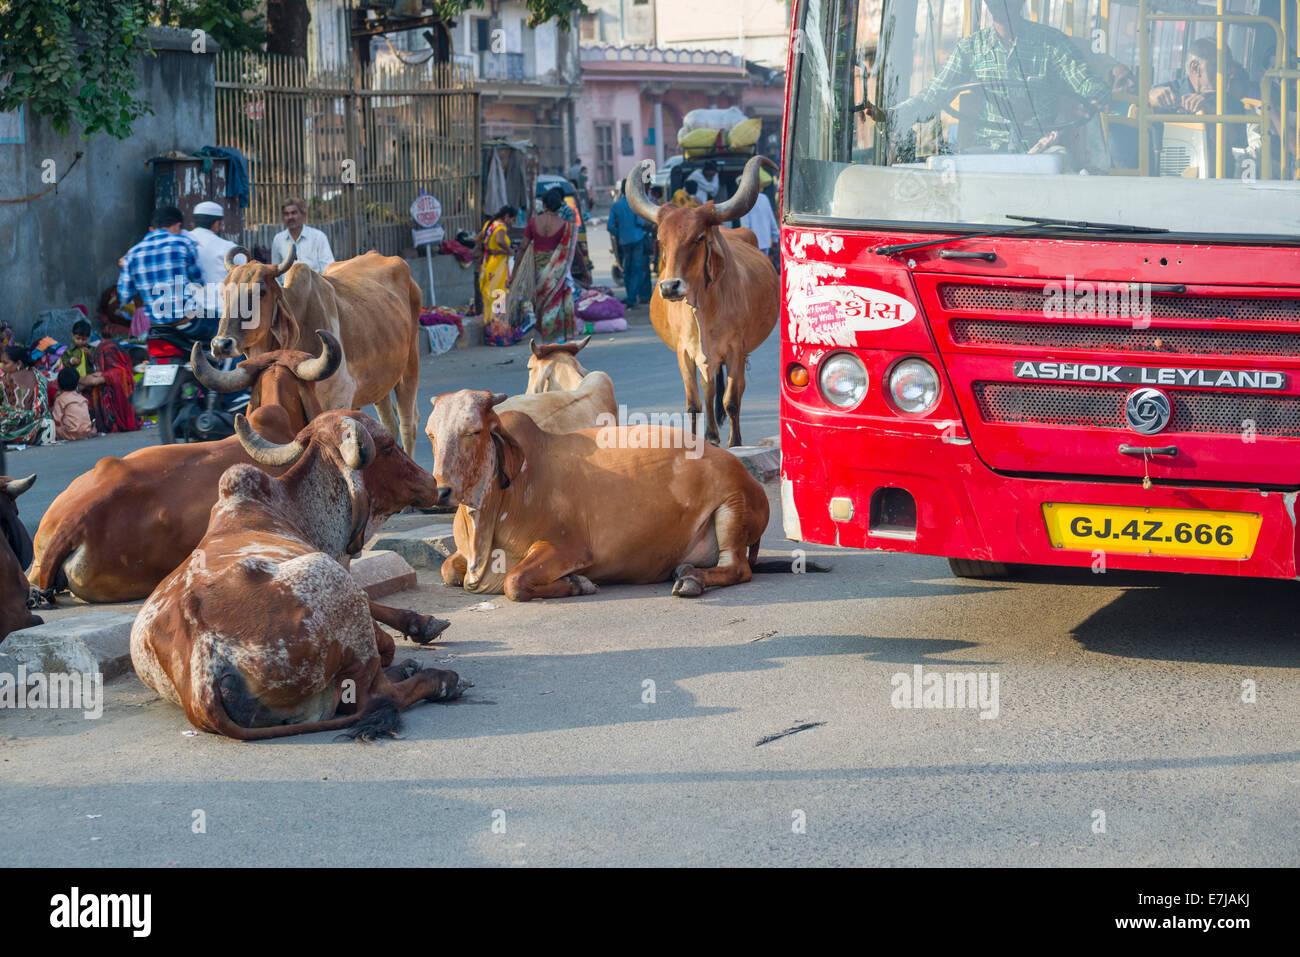 Cattle on the street blocking the traffic, Bhavnagar, Gujarat, India - Stock Image